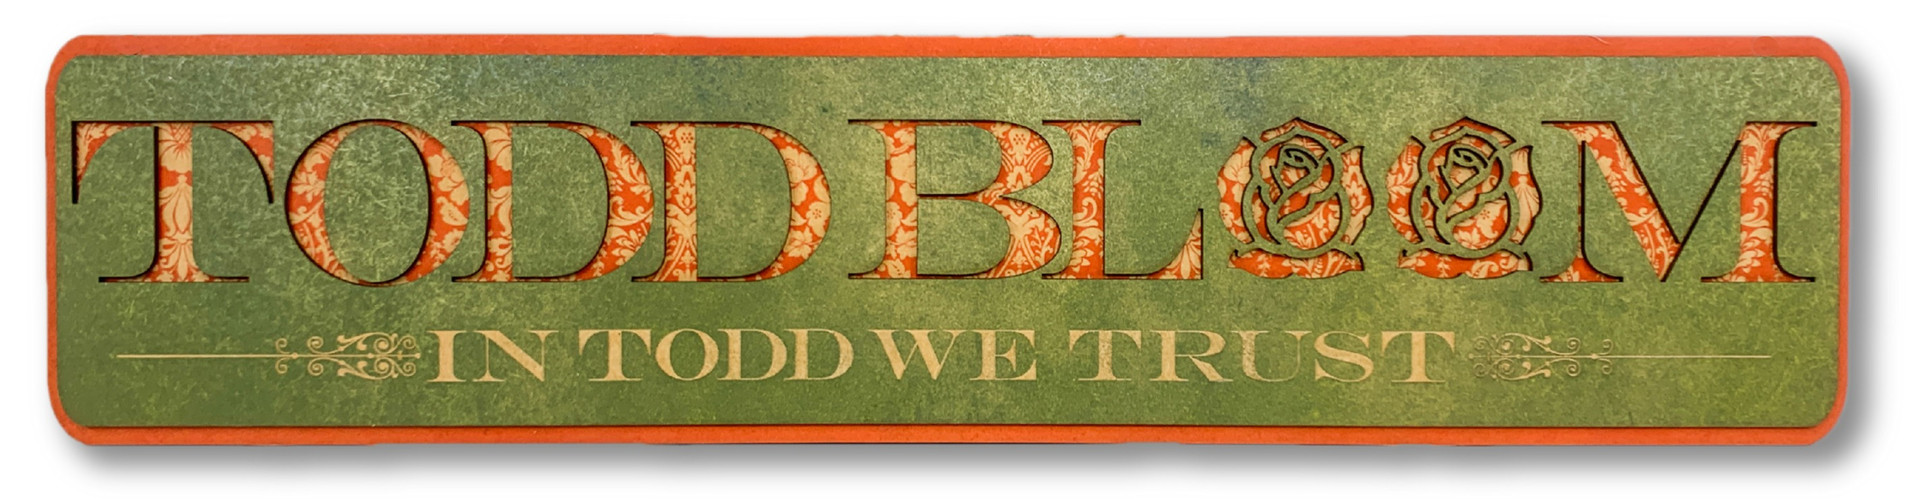 CUSTOM WOOD SIGN | TODD BLOOM